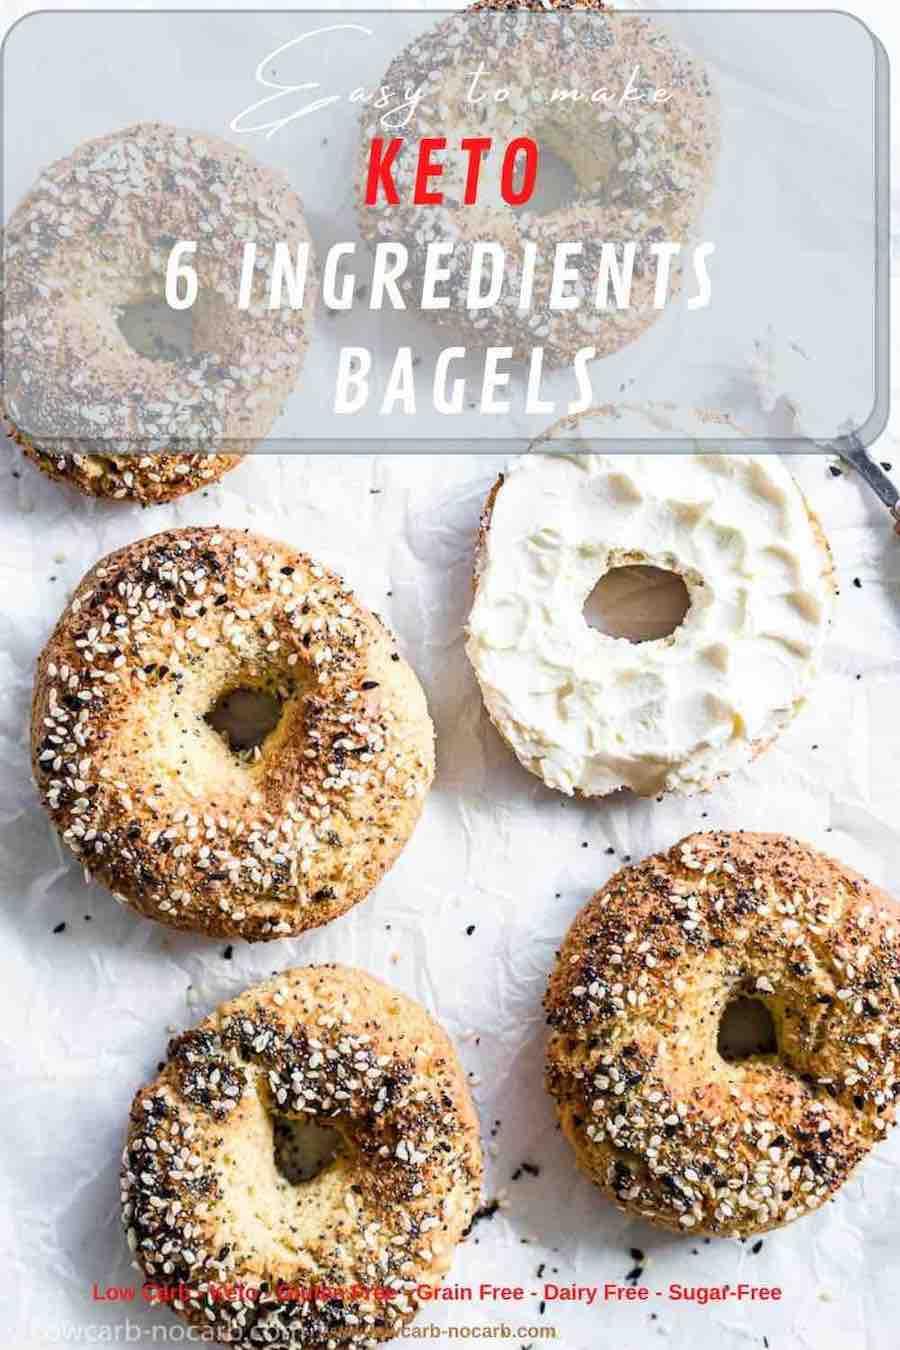 Tasty Keto Bagels For Breakfast